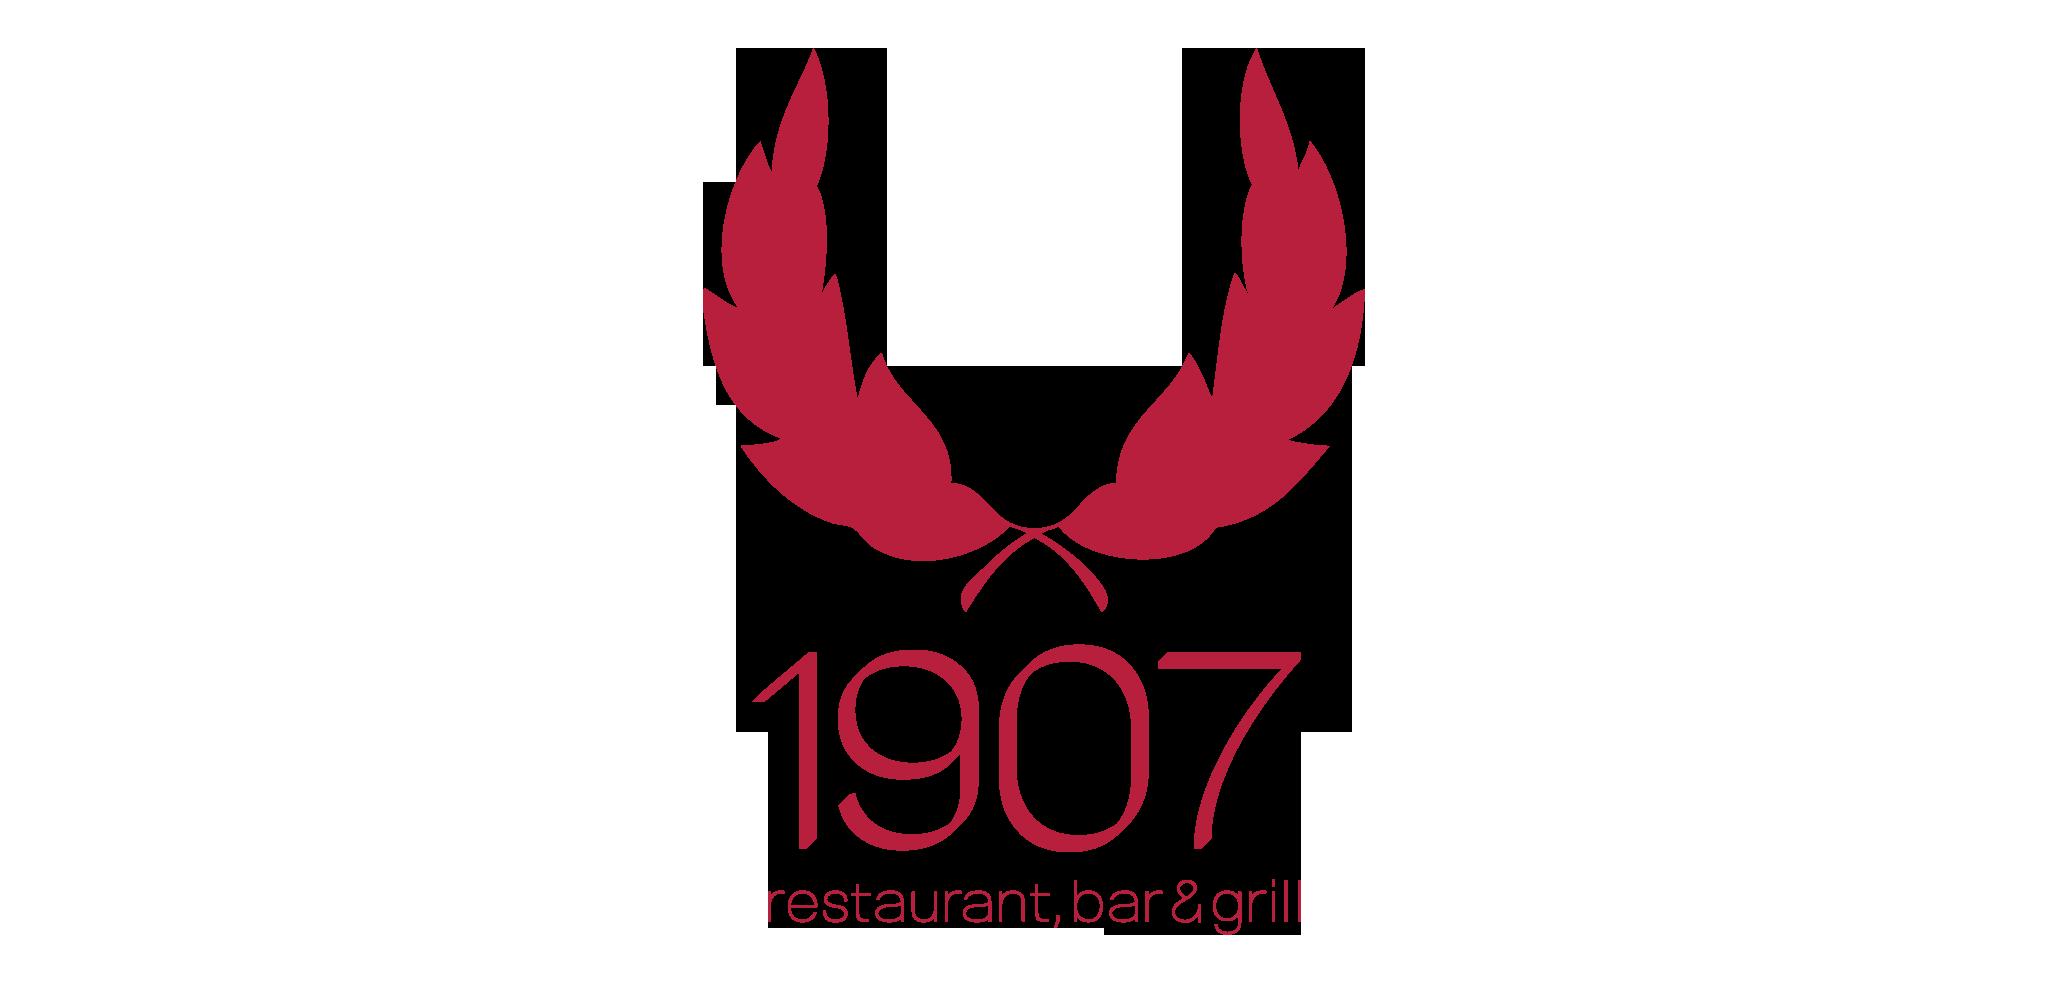 1907 Restaurant Weybridge